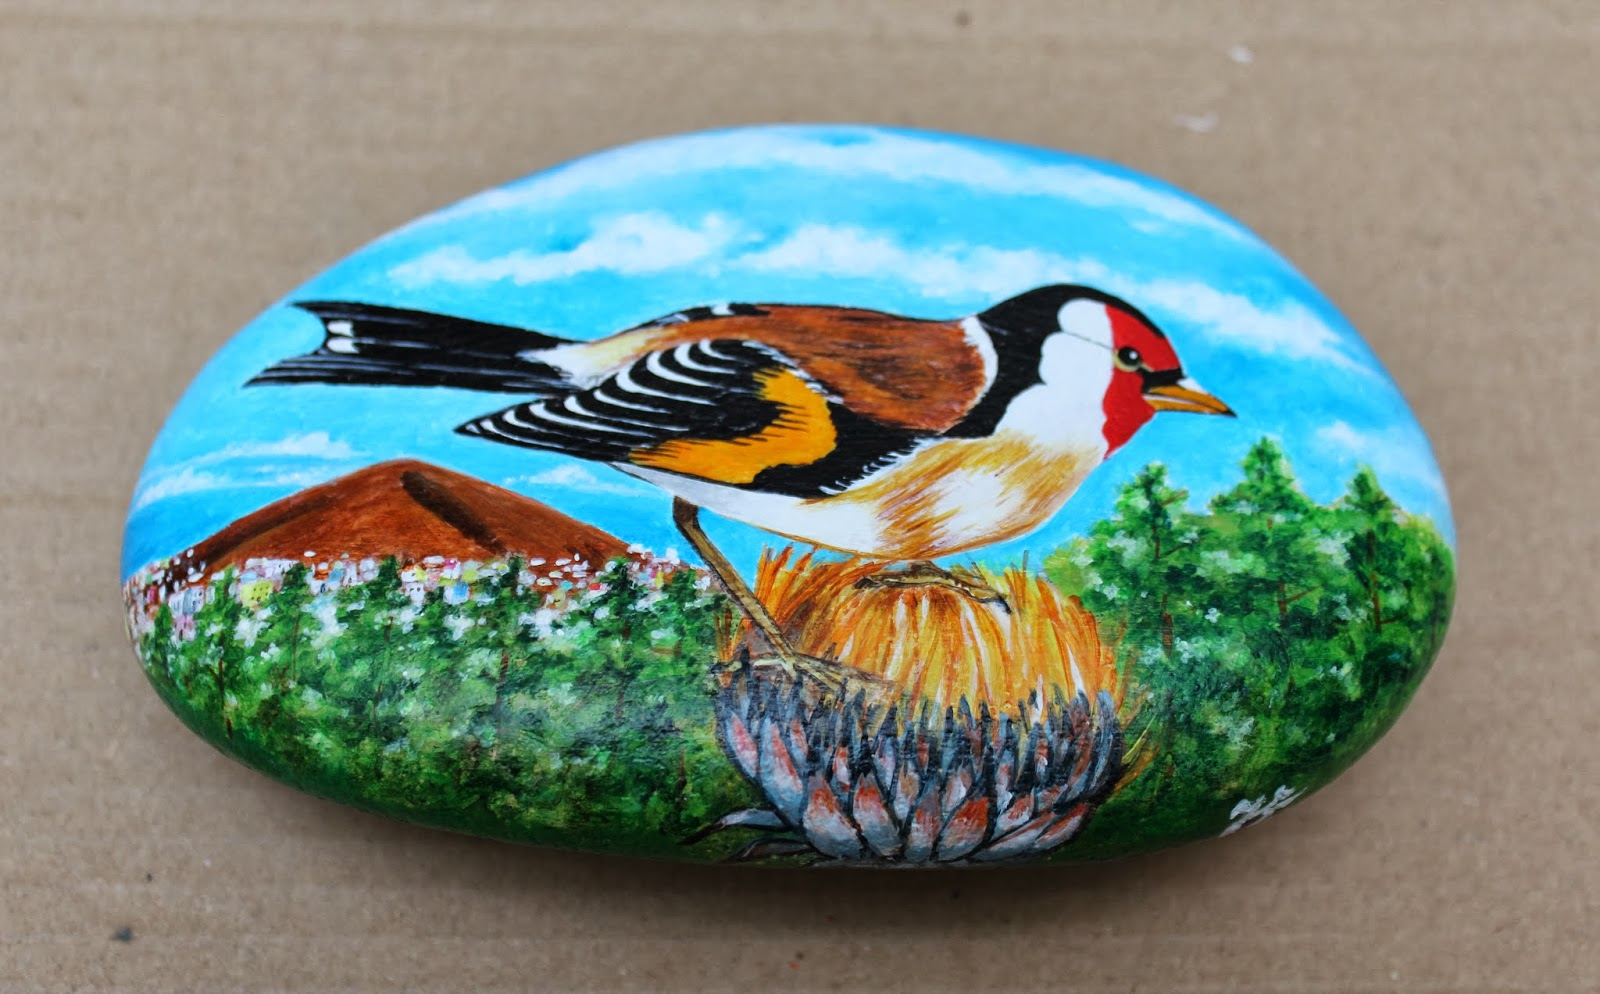 artesano miniaturista pintura y pirograbado piedras pintadas